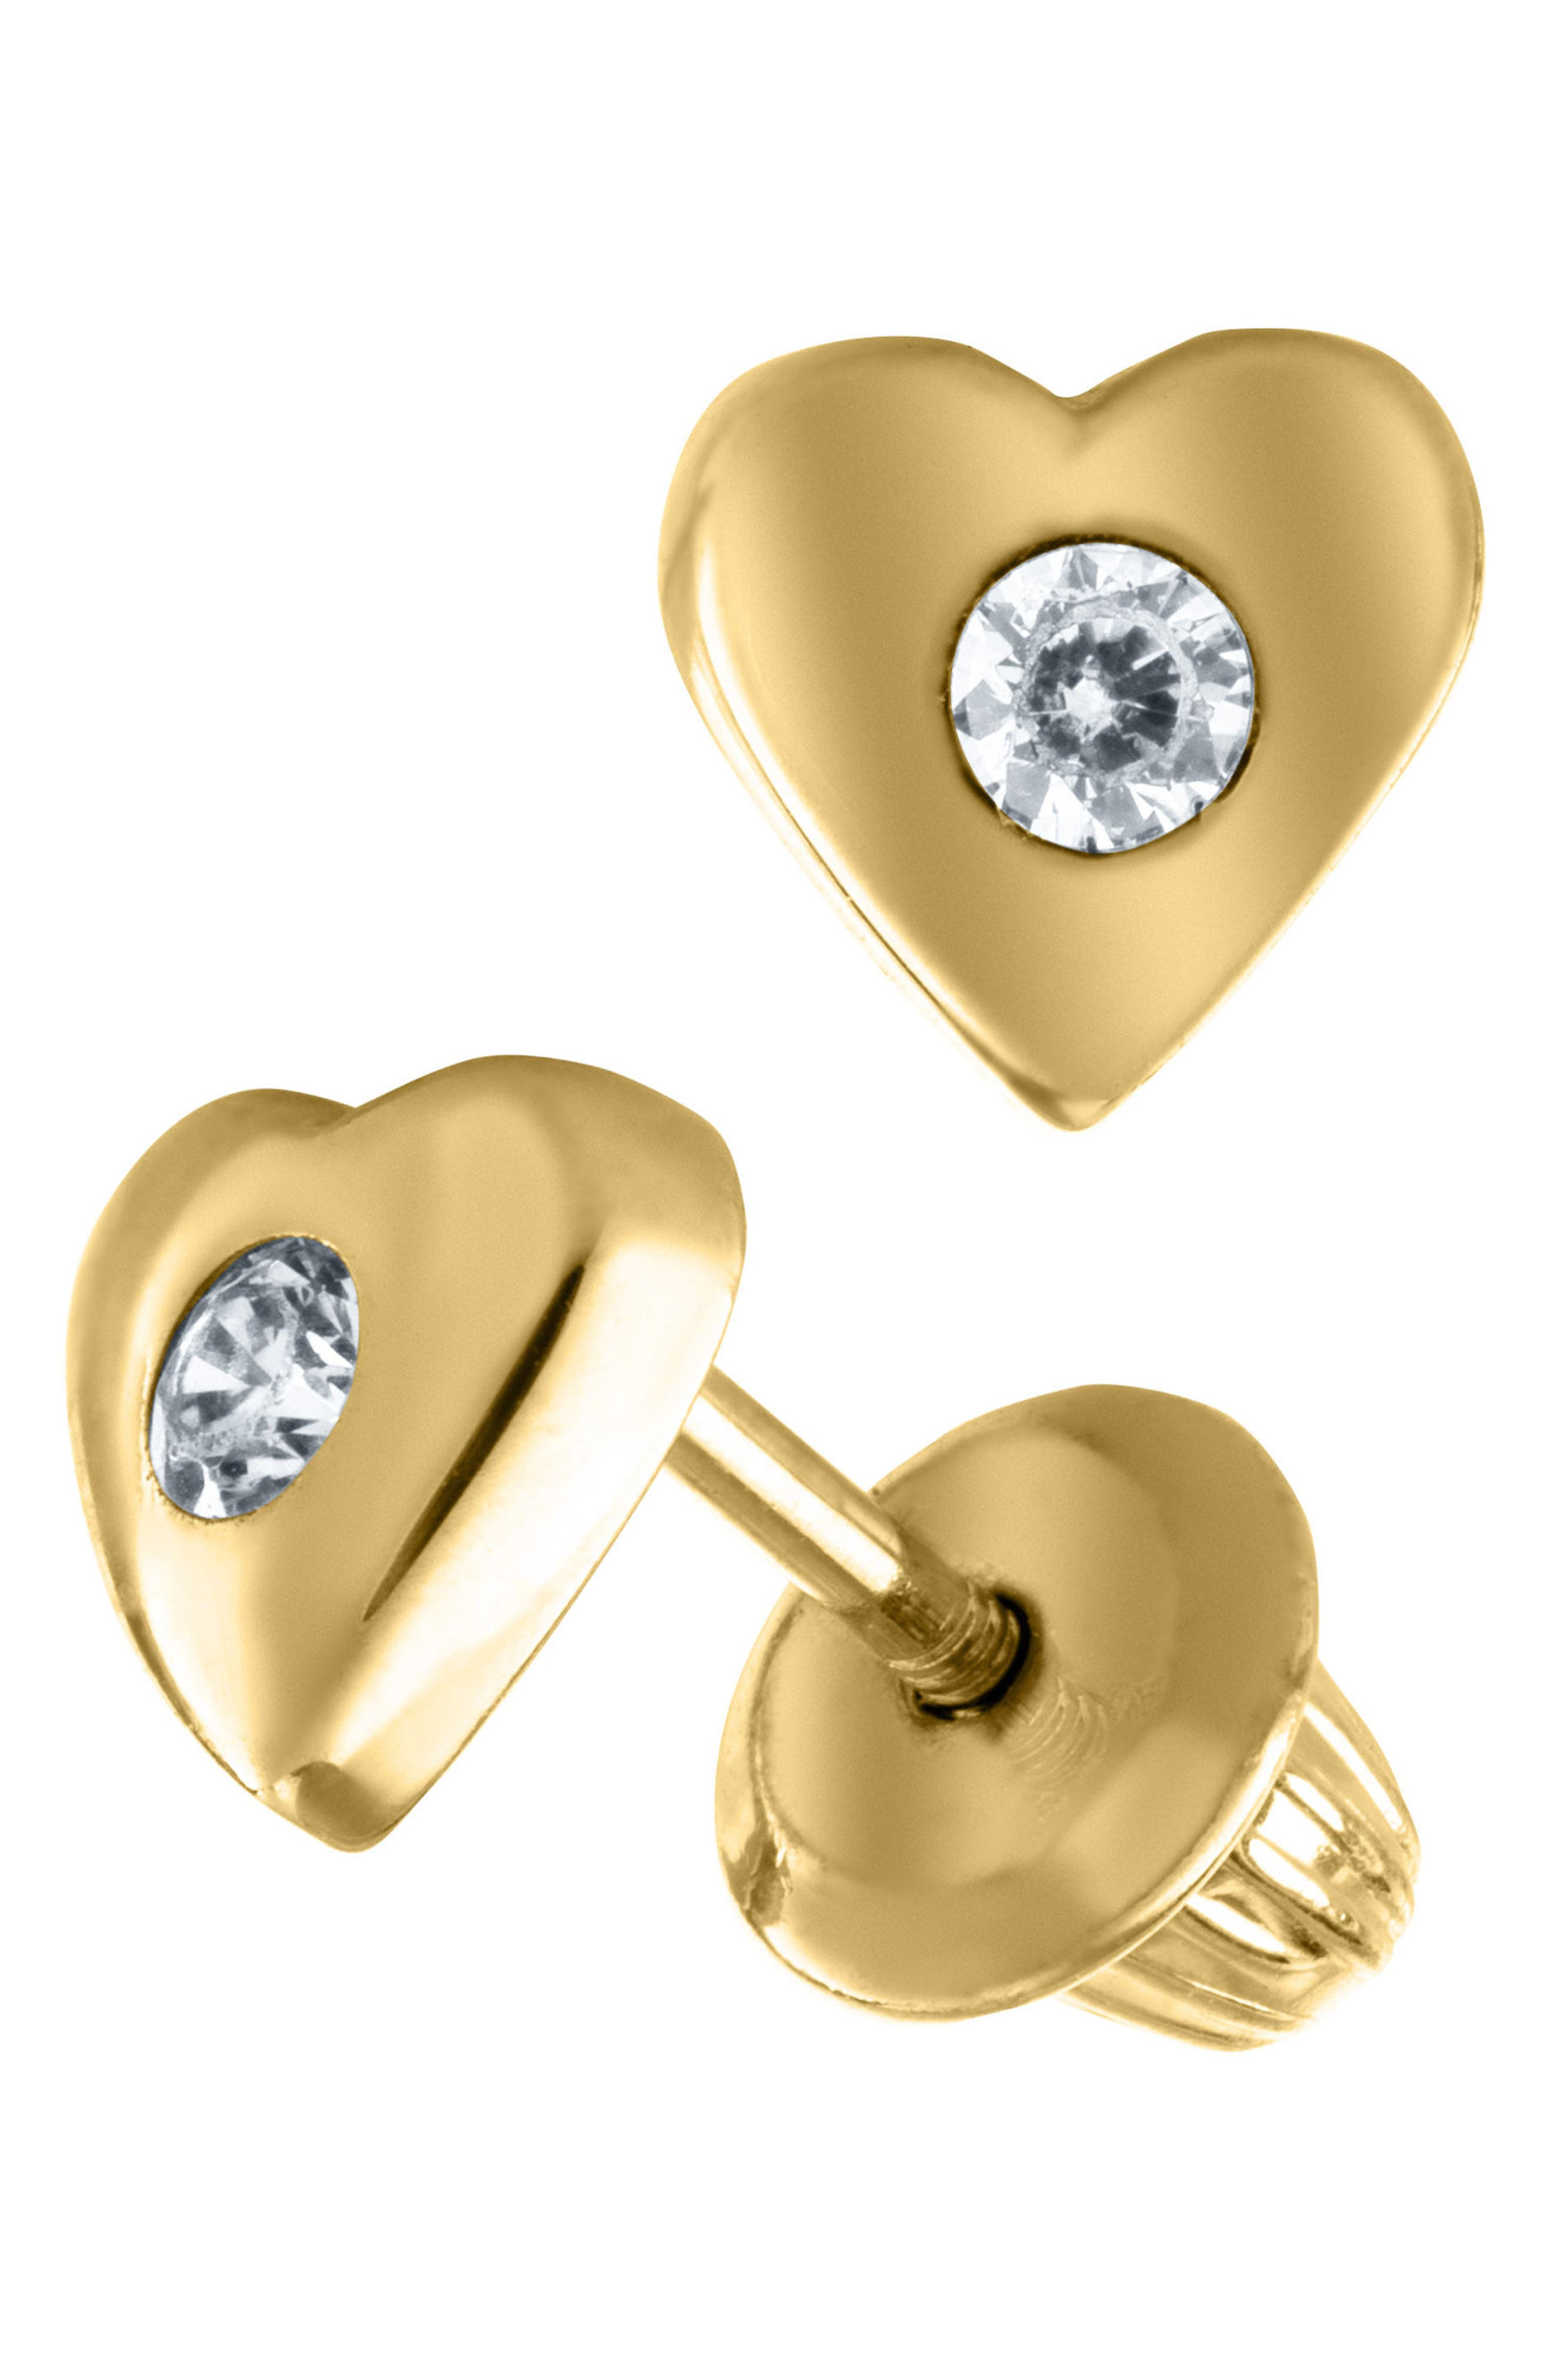 14k Gold & Cubic Zirconia Heart Earrings,                             Alternate thumbnail 2, color,                             GOLD